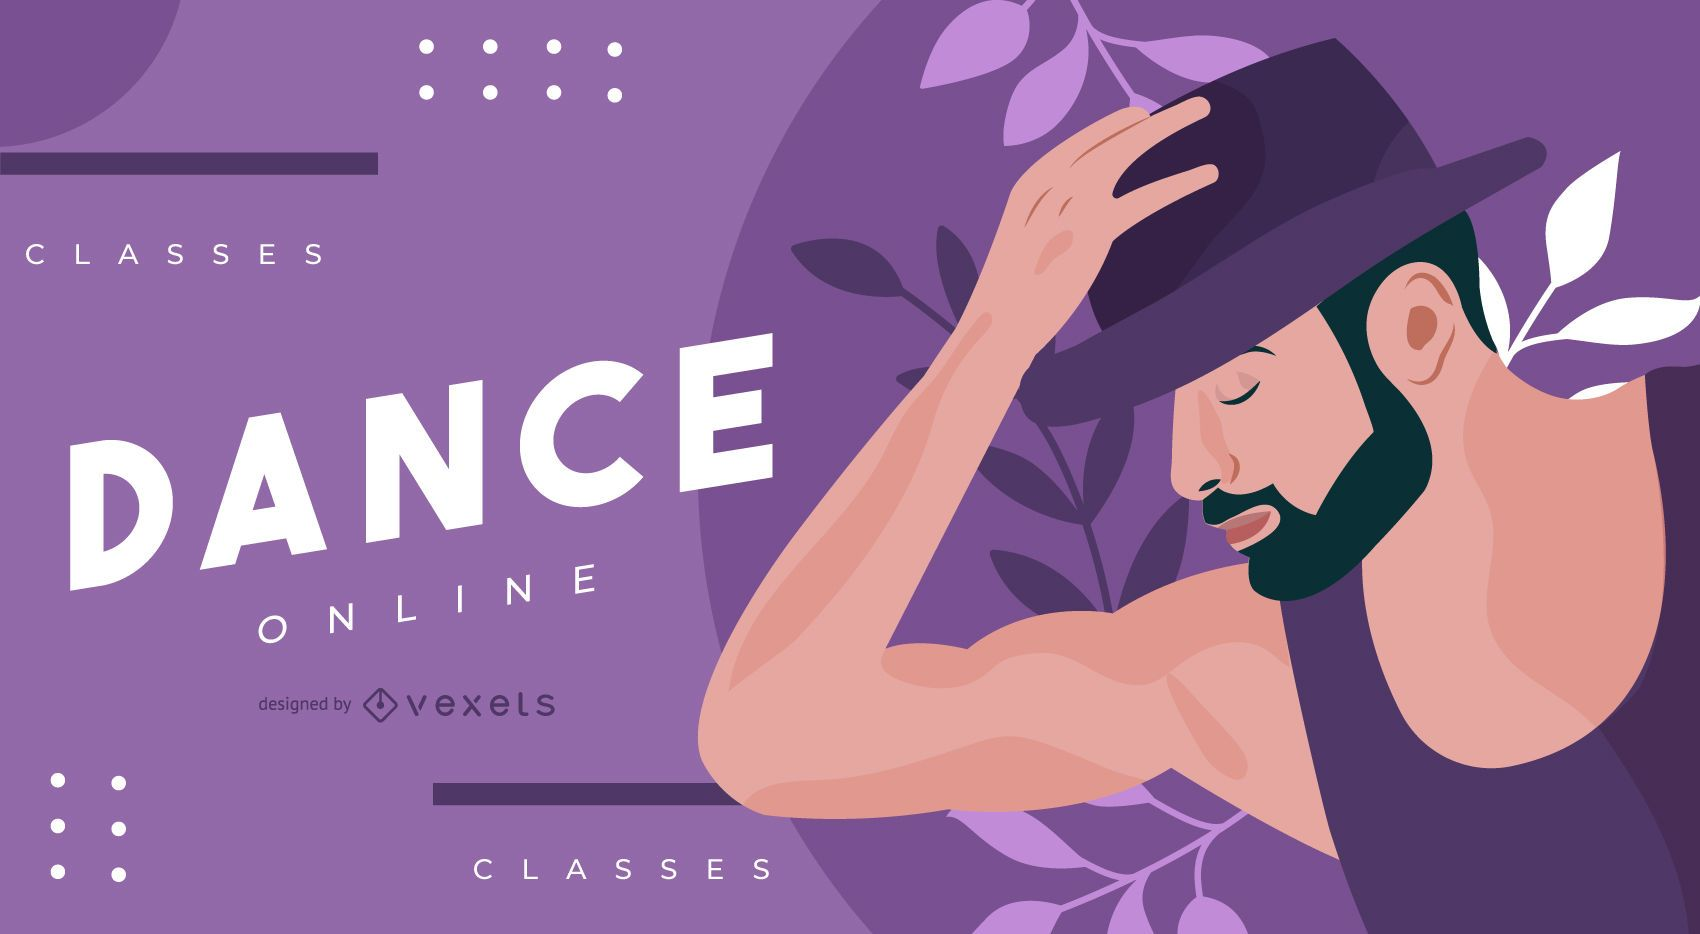 Dance online slider template